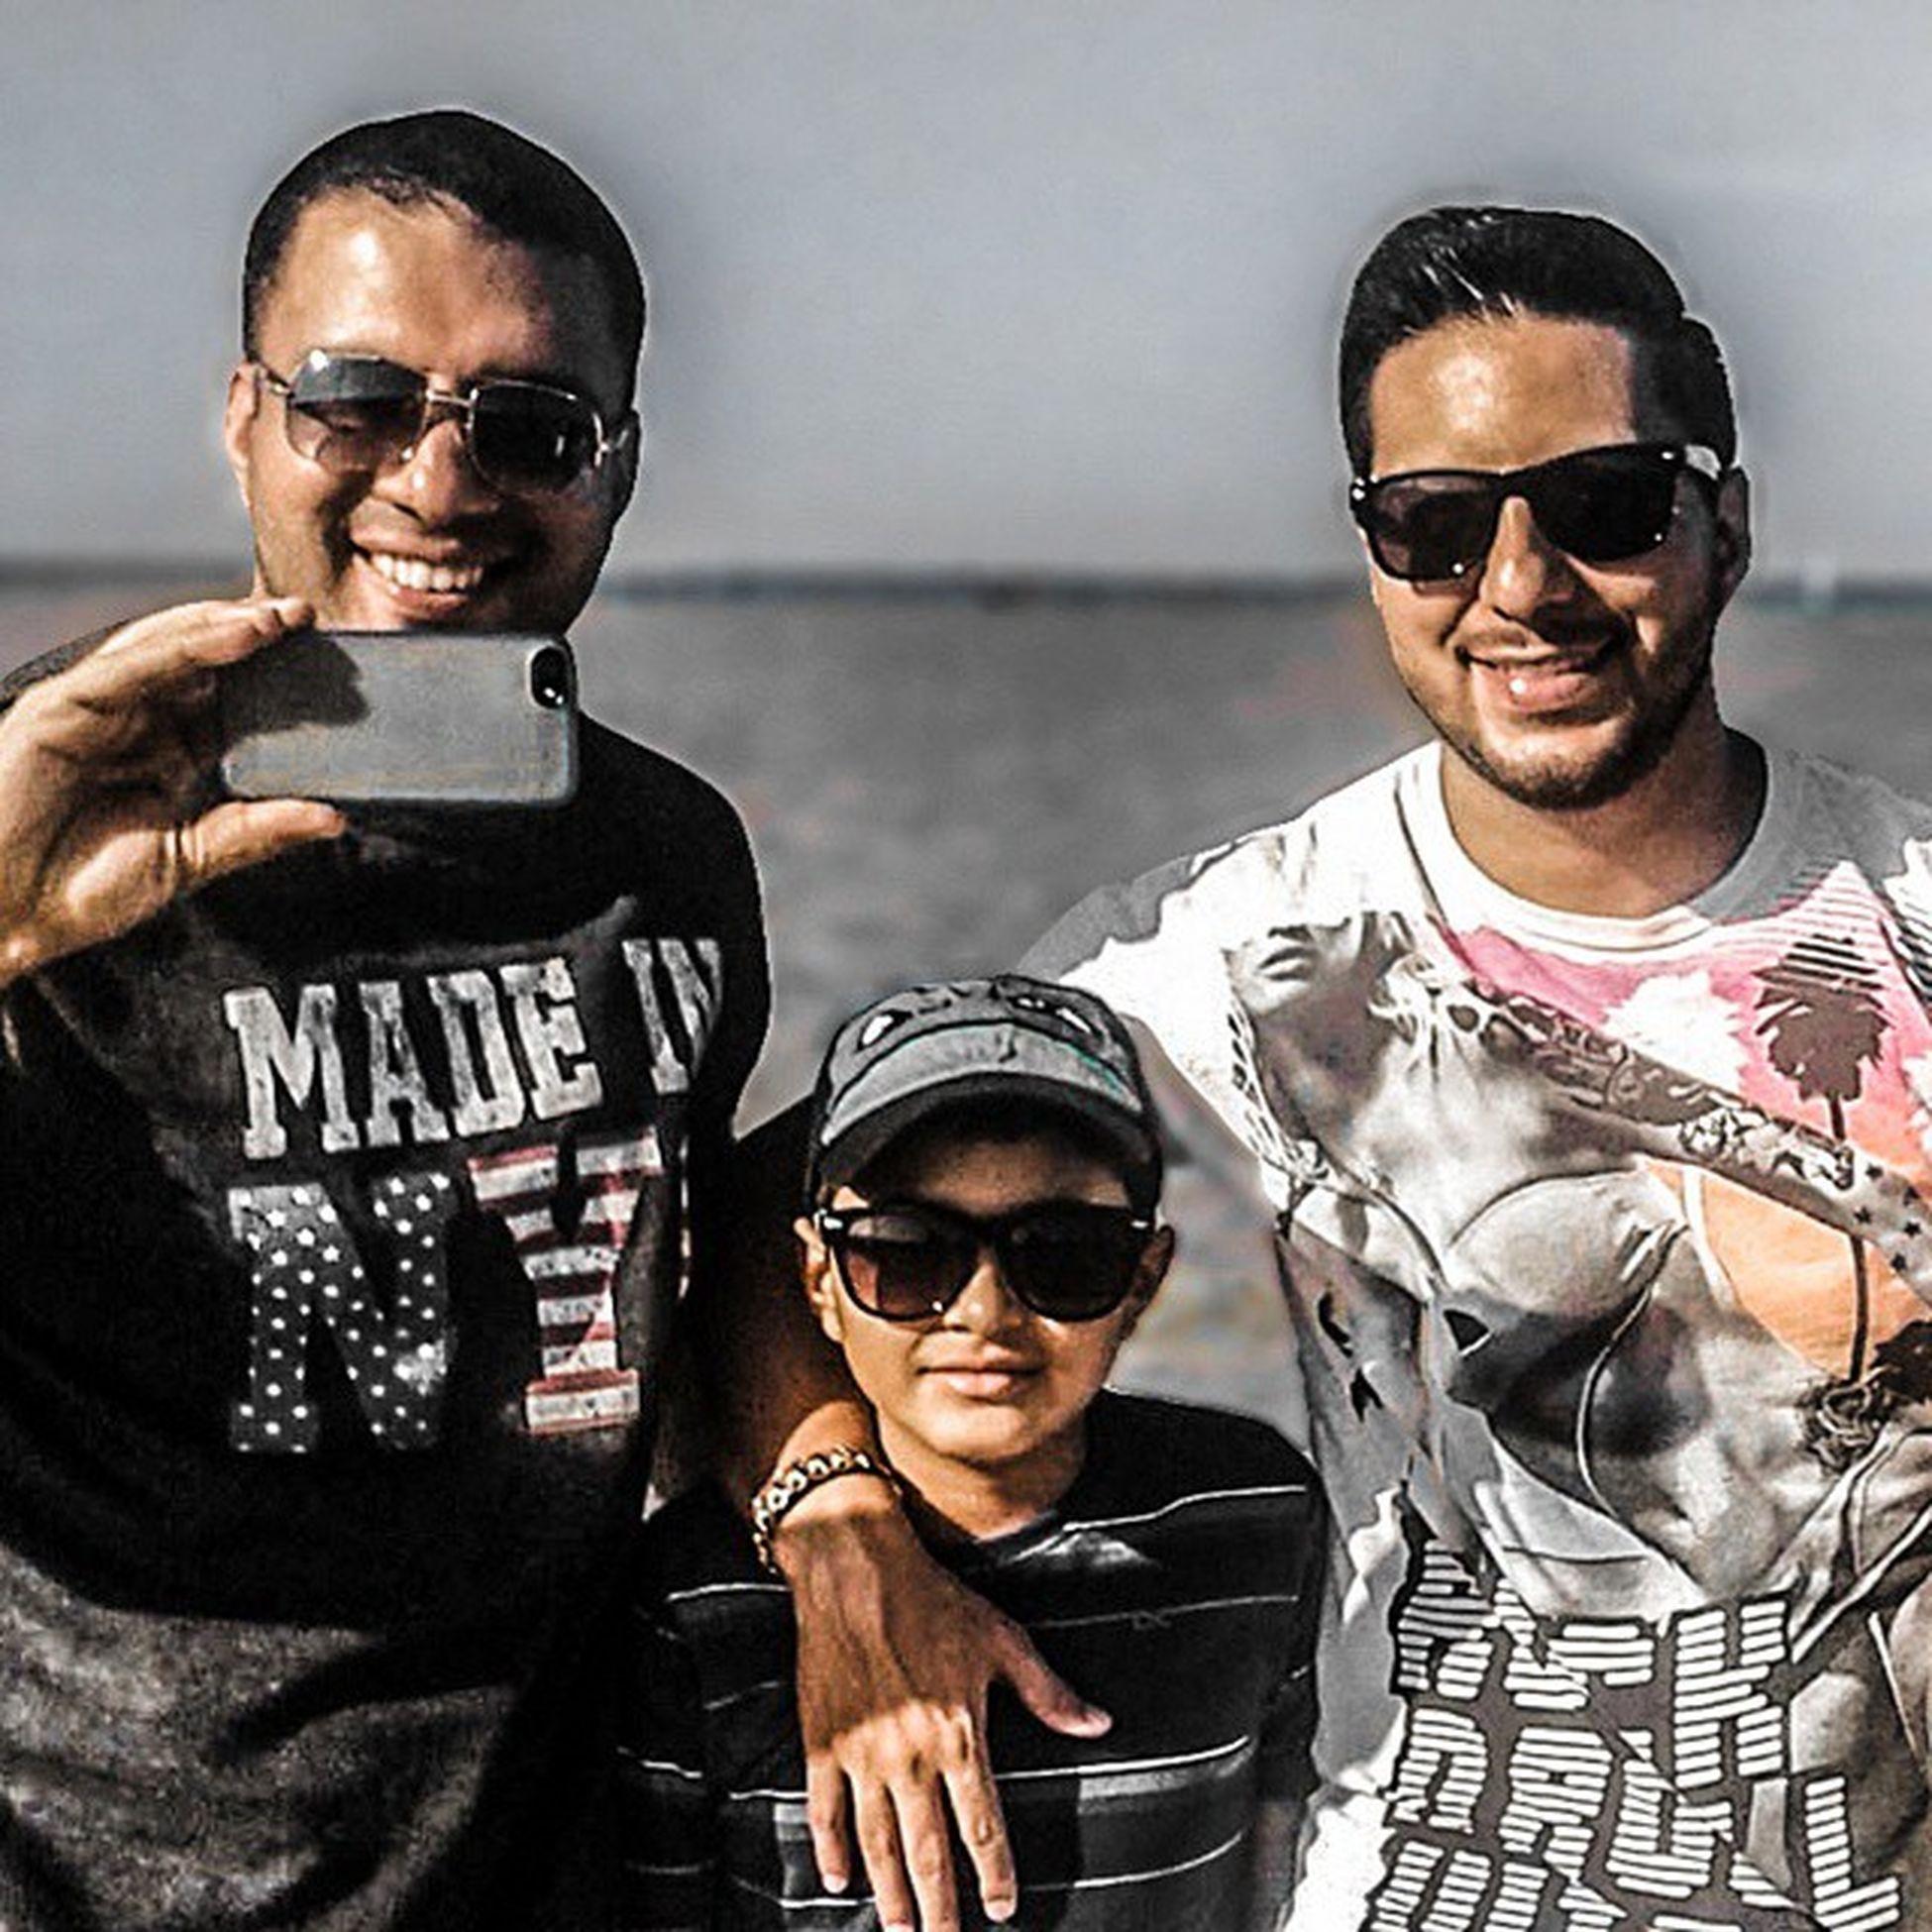 MaleconAvenidaDelRioBq FotosHermosas BarranquillaCol Hermanos Juanda MomentosUnicos